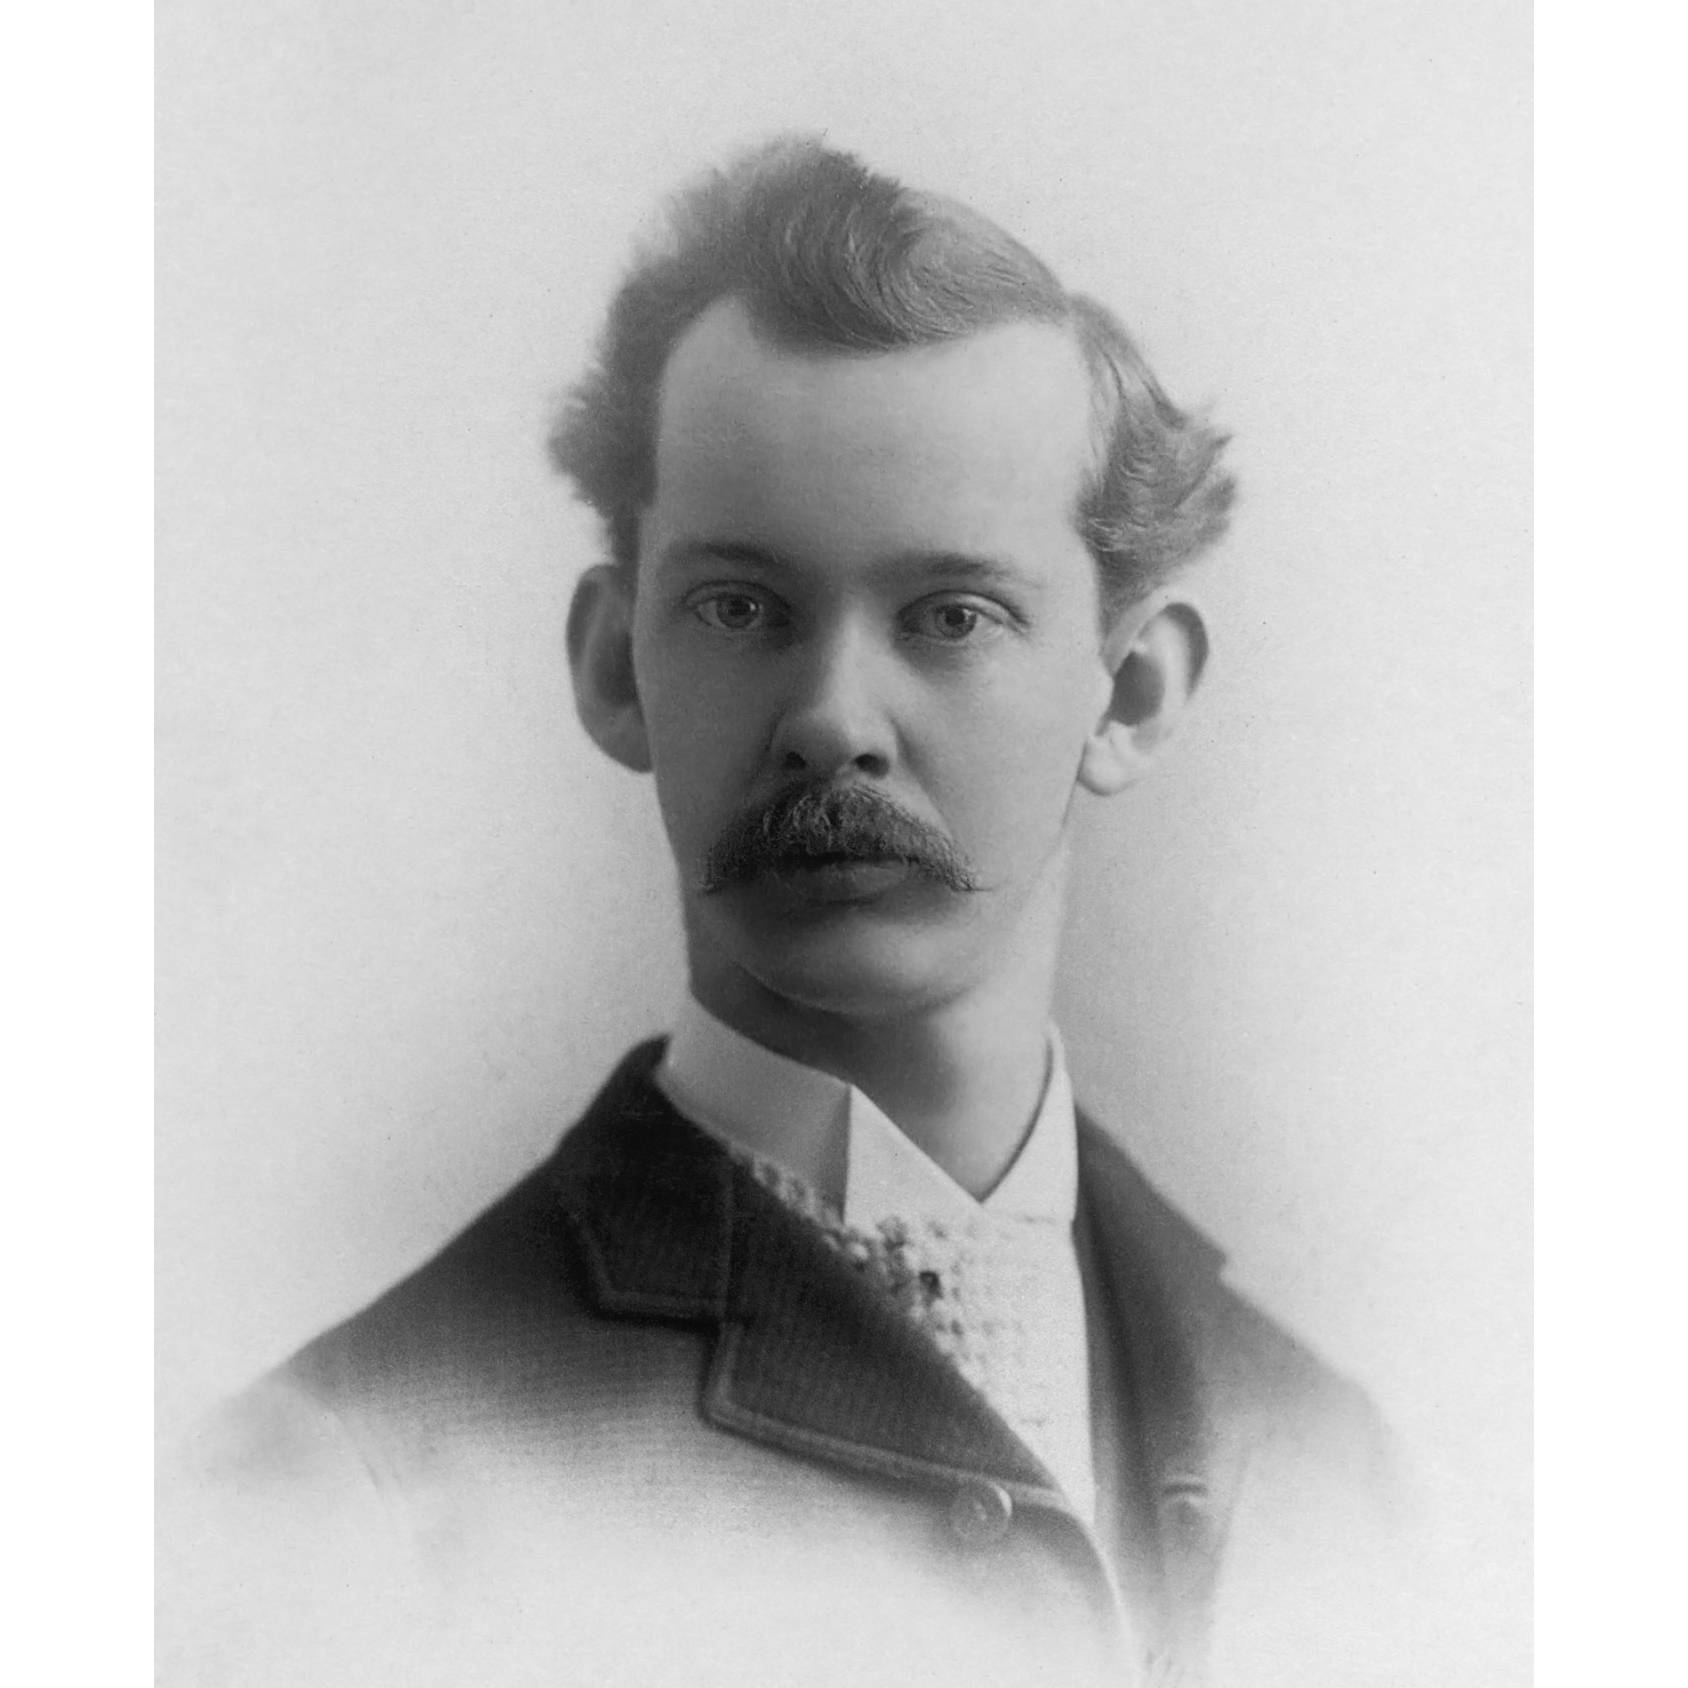 Wilbur Scoville - Creator of the Scoville Heat Scale